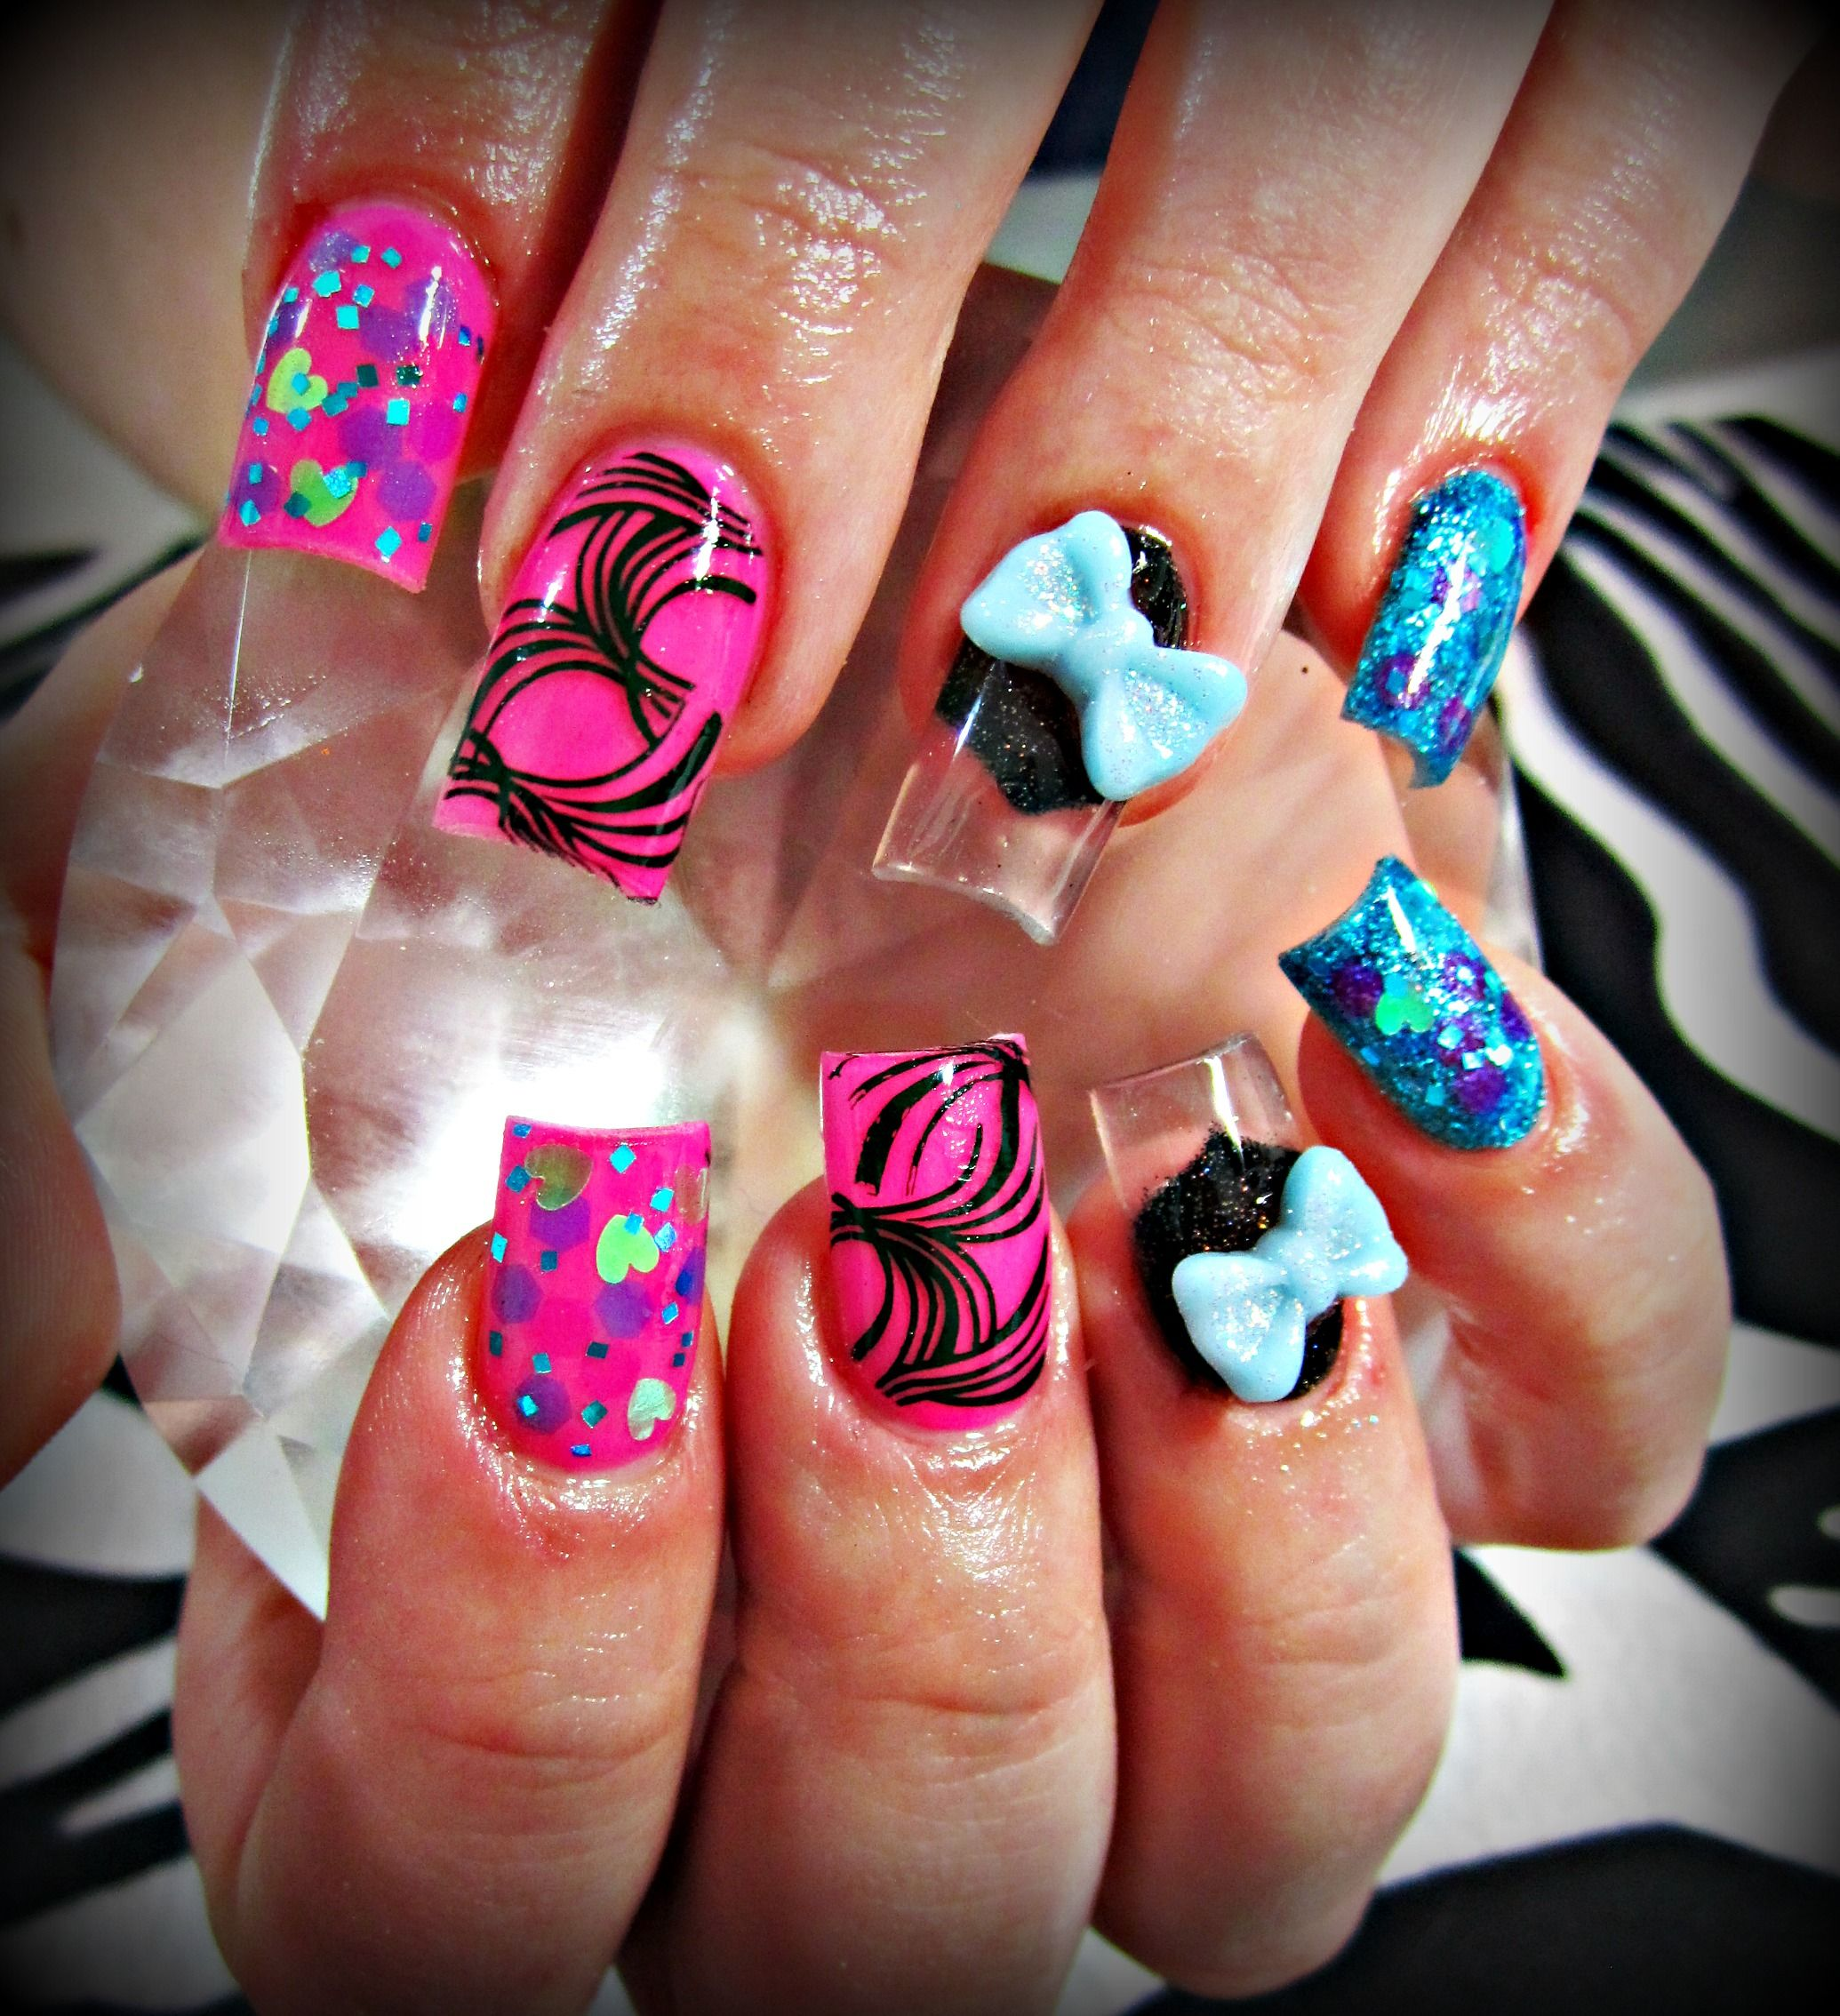 Bubble Gum Nail Art: Bubble Gum Swirl Acrylic Nails